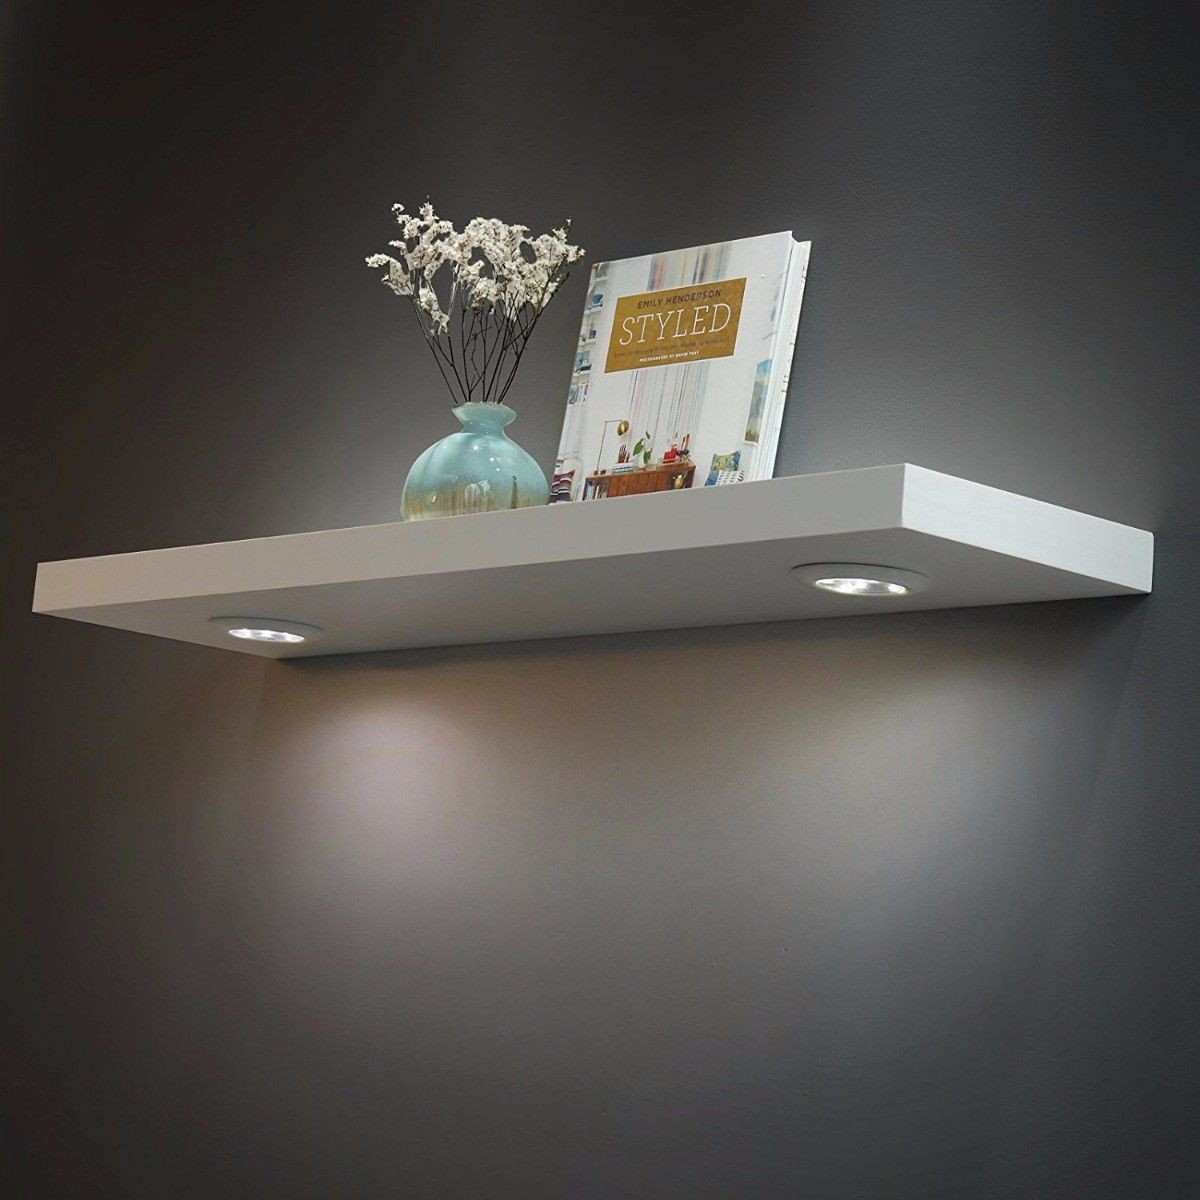 welland floating wall shelf with led lights white shelves concrete floor prep for vinyl tile kitchen island cart seating mantel french fixings desk drawers ikea hanging bracket